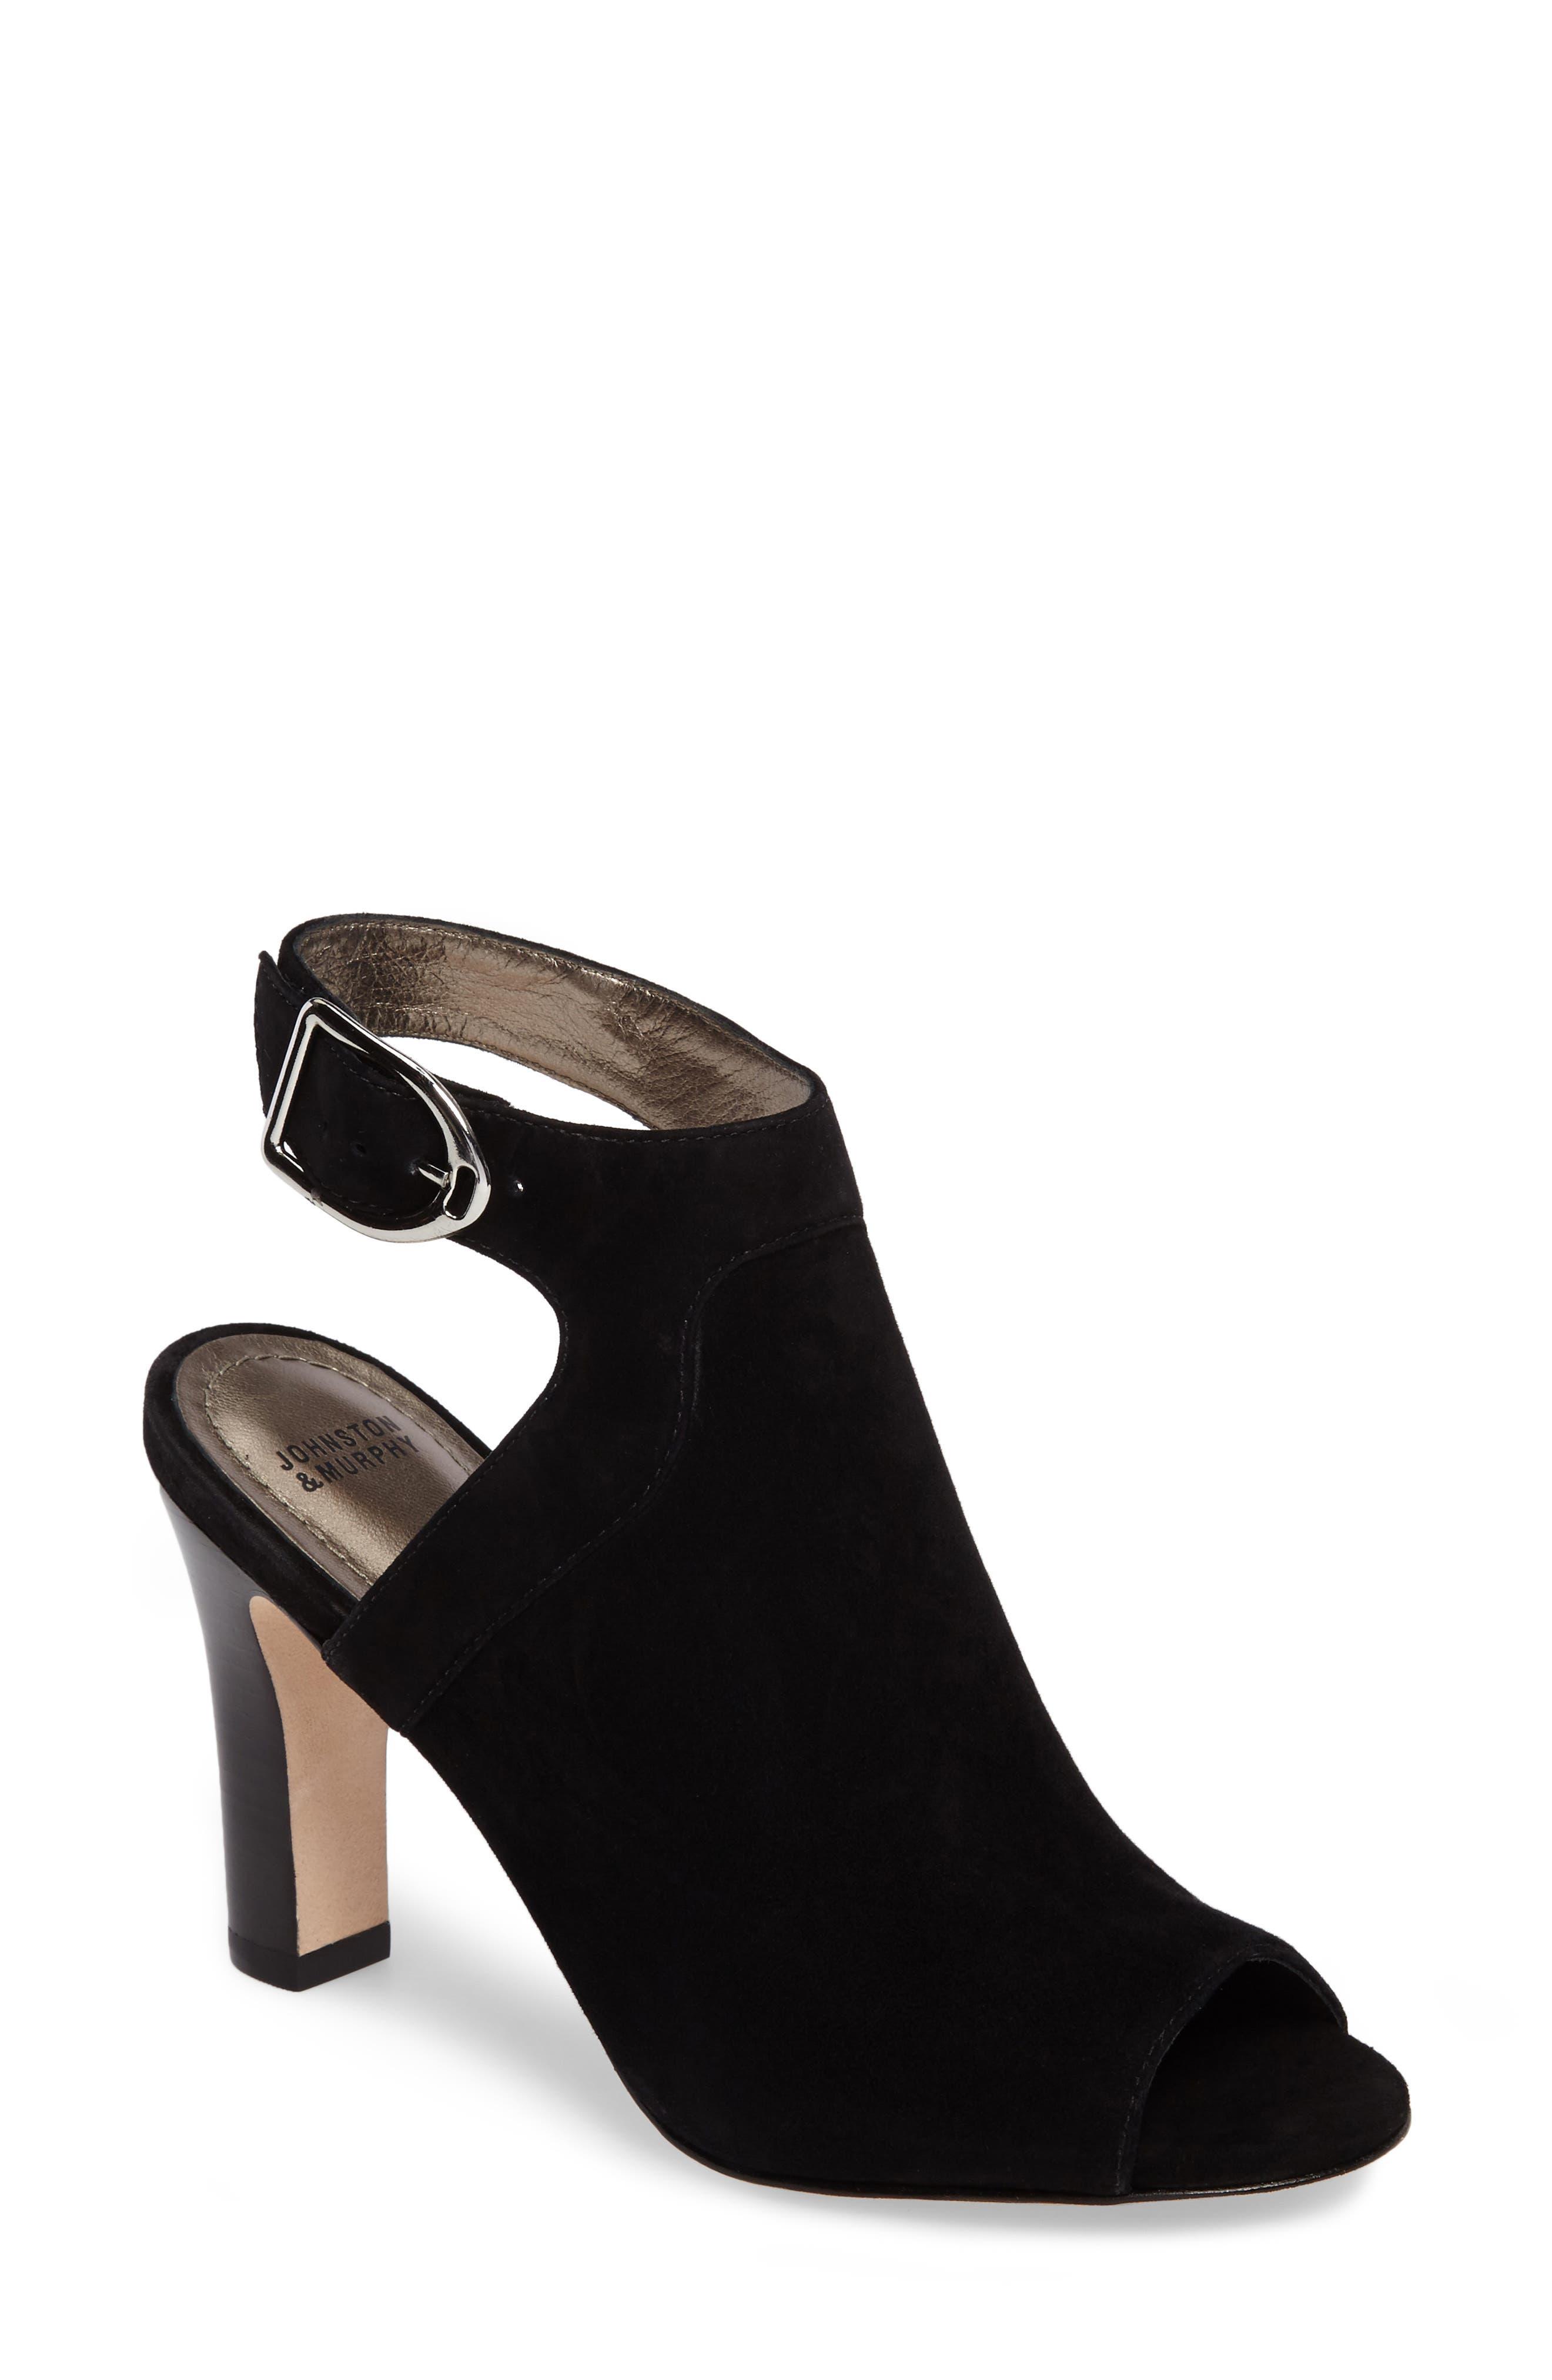 Cassie Peep Toe Sandal,                             Main thumbnail 1, color,                             BLACK LEATHER